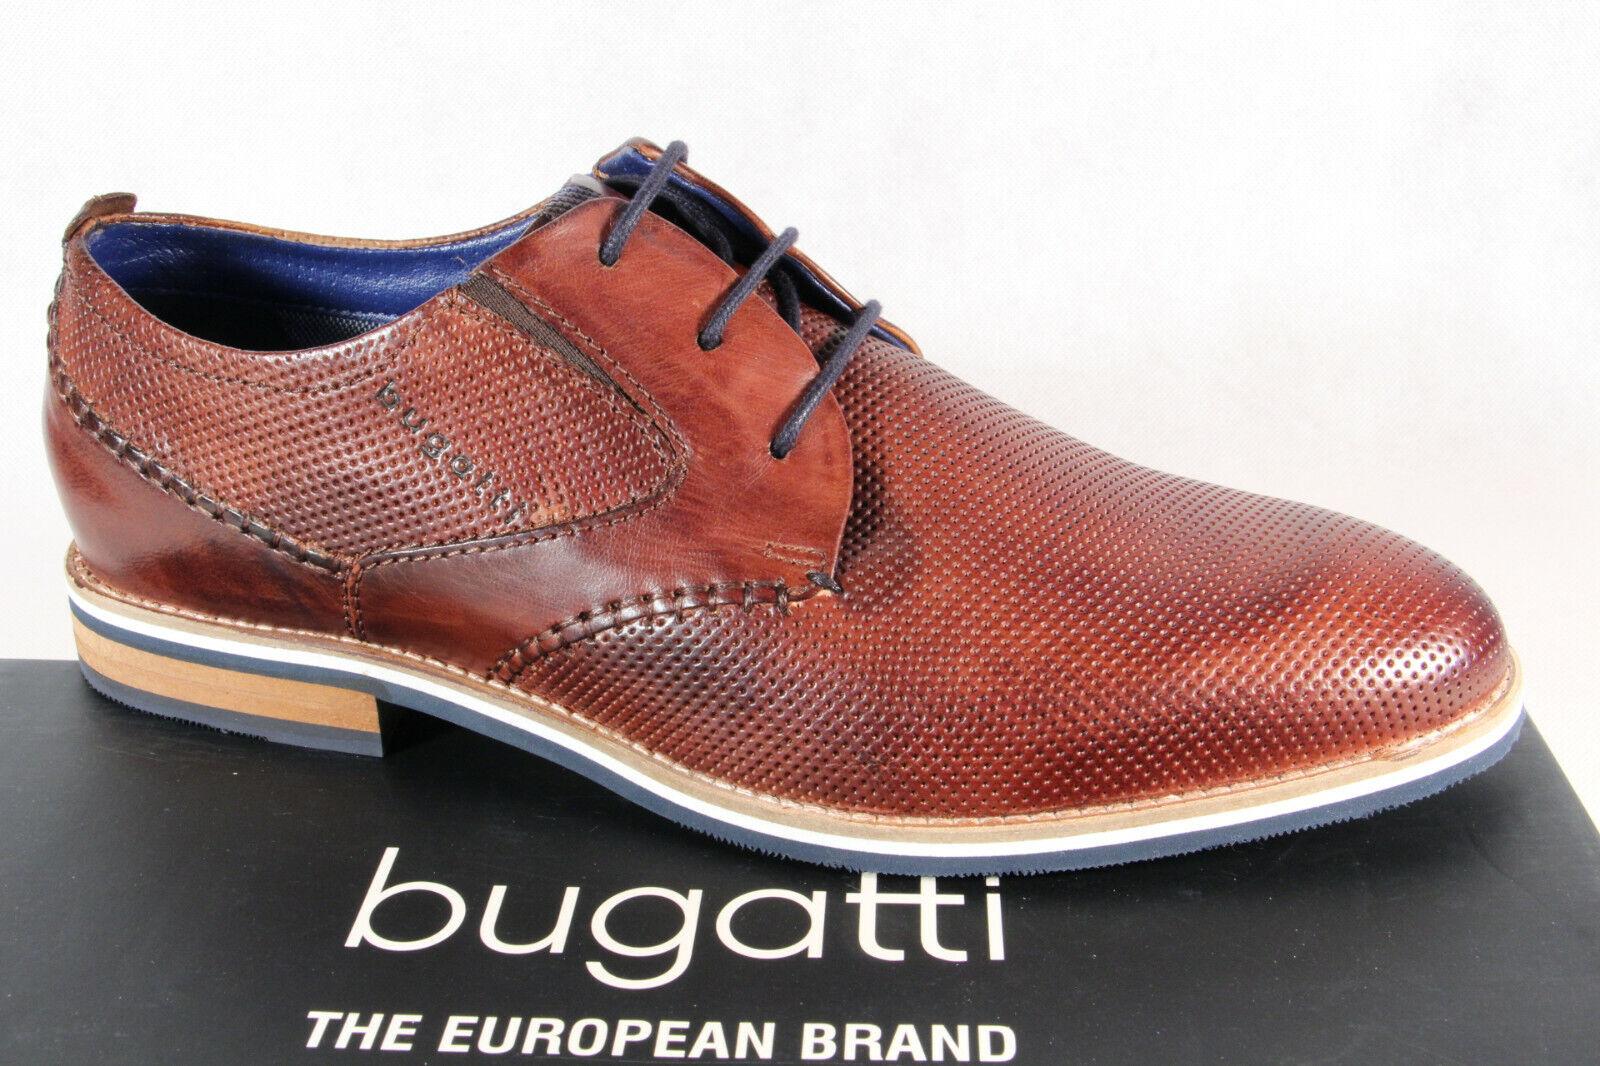 Bugatti Herren Schnürschuh Schnürschuhe Halbschuhe Sneaker braun 69403 NEU!